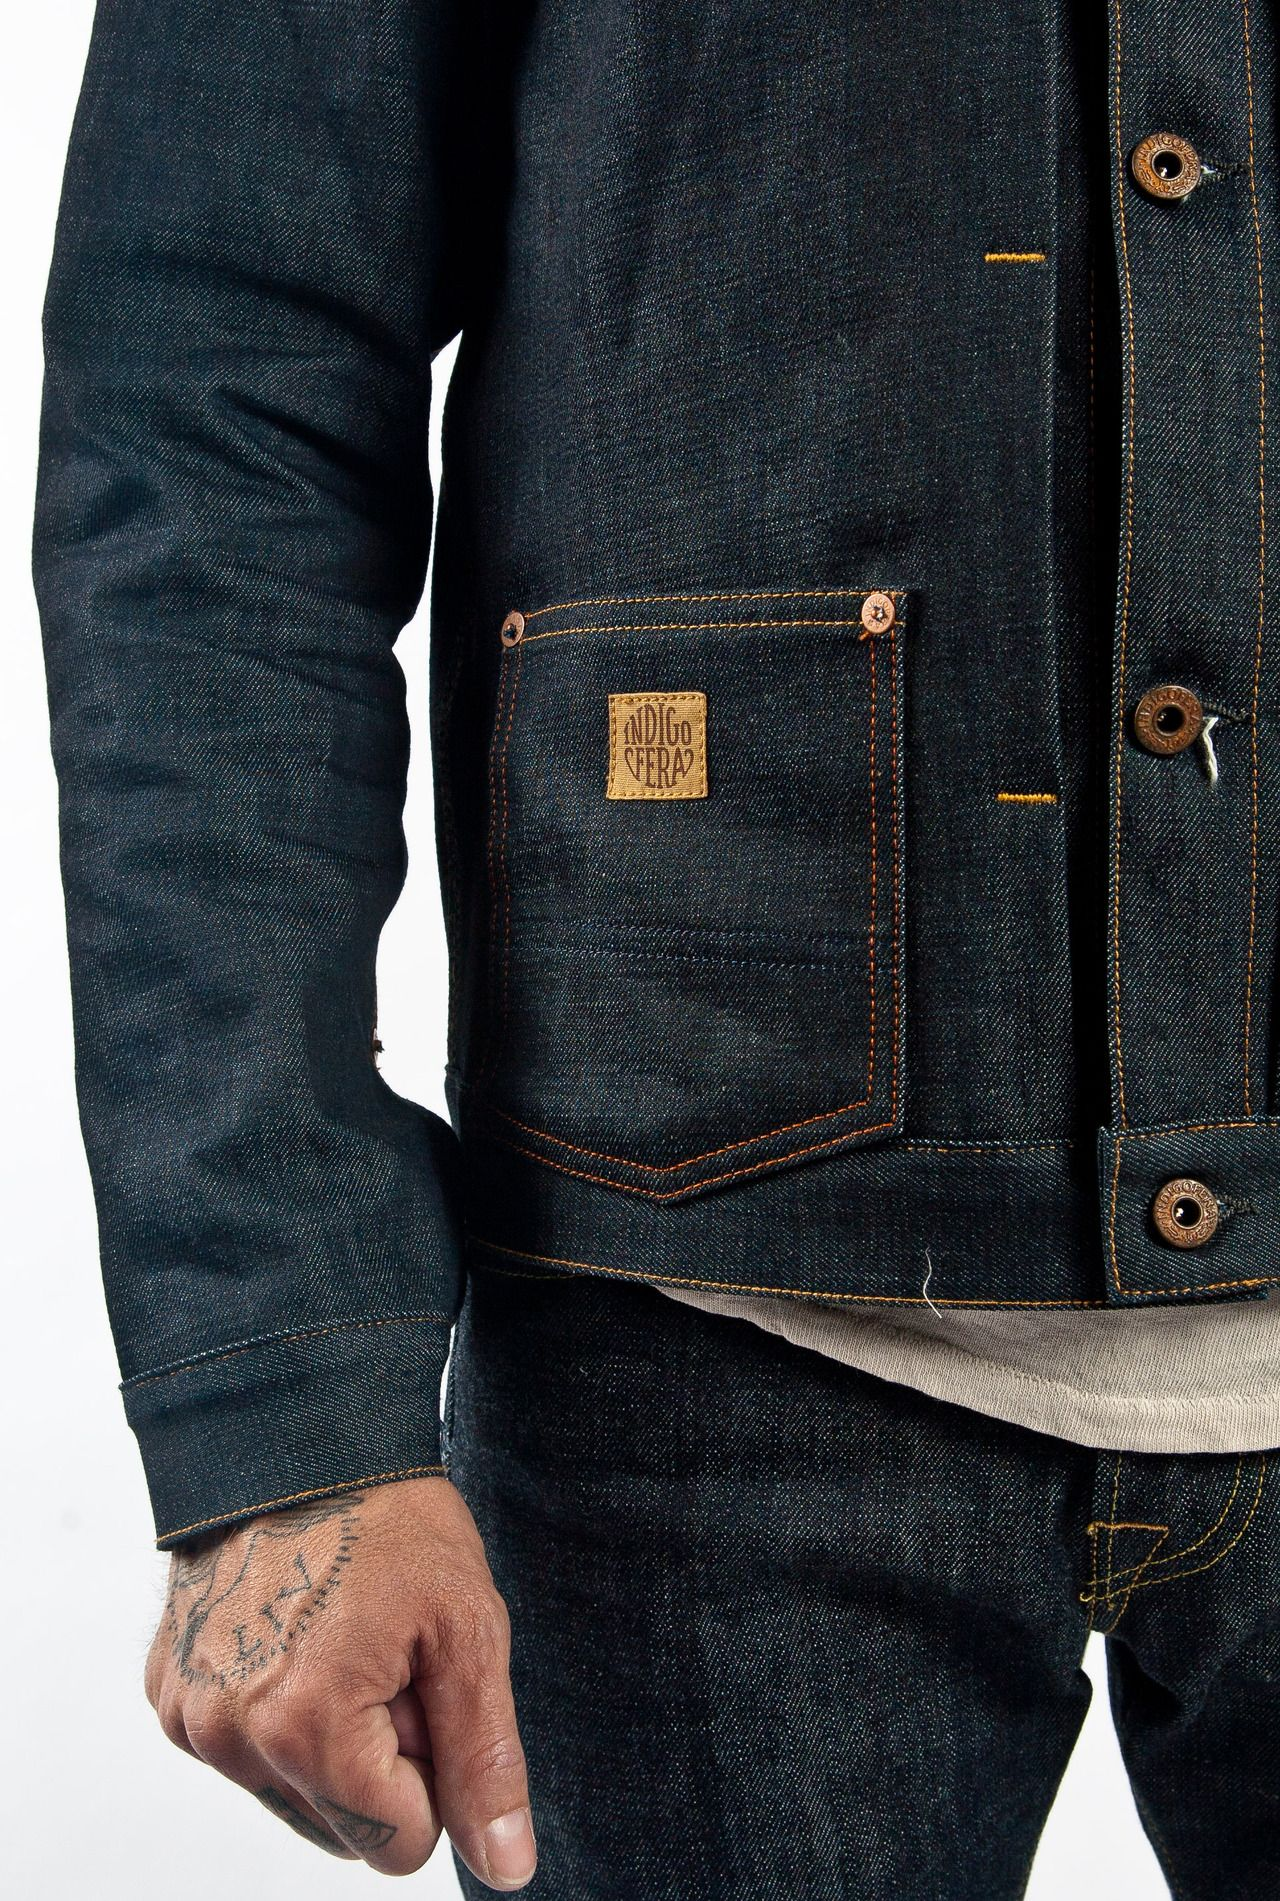 Mode Pinterest Denim Dstore Jacket Grant Vintage Indigofera OCwnqUApSx